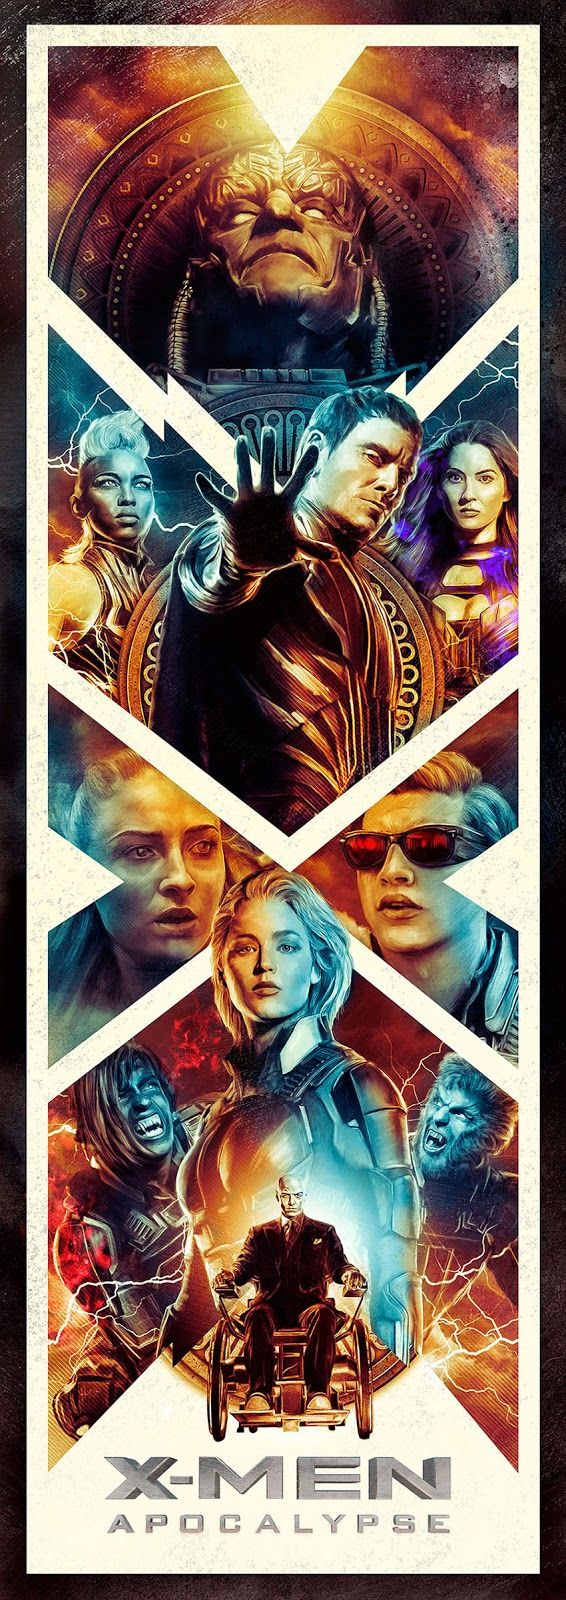 Wallpaper iphone 6 xman - X Men Apocalypse By Richard Davies Home Of The Alternative Movie Poster Amp